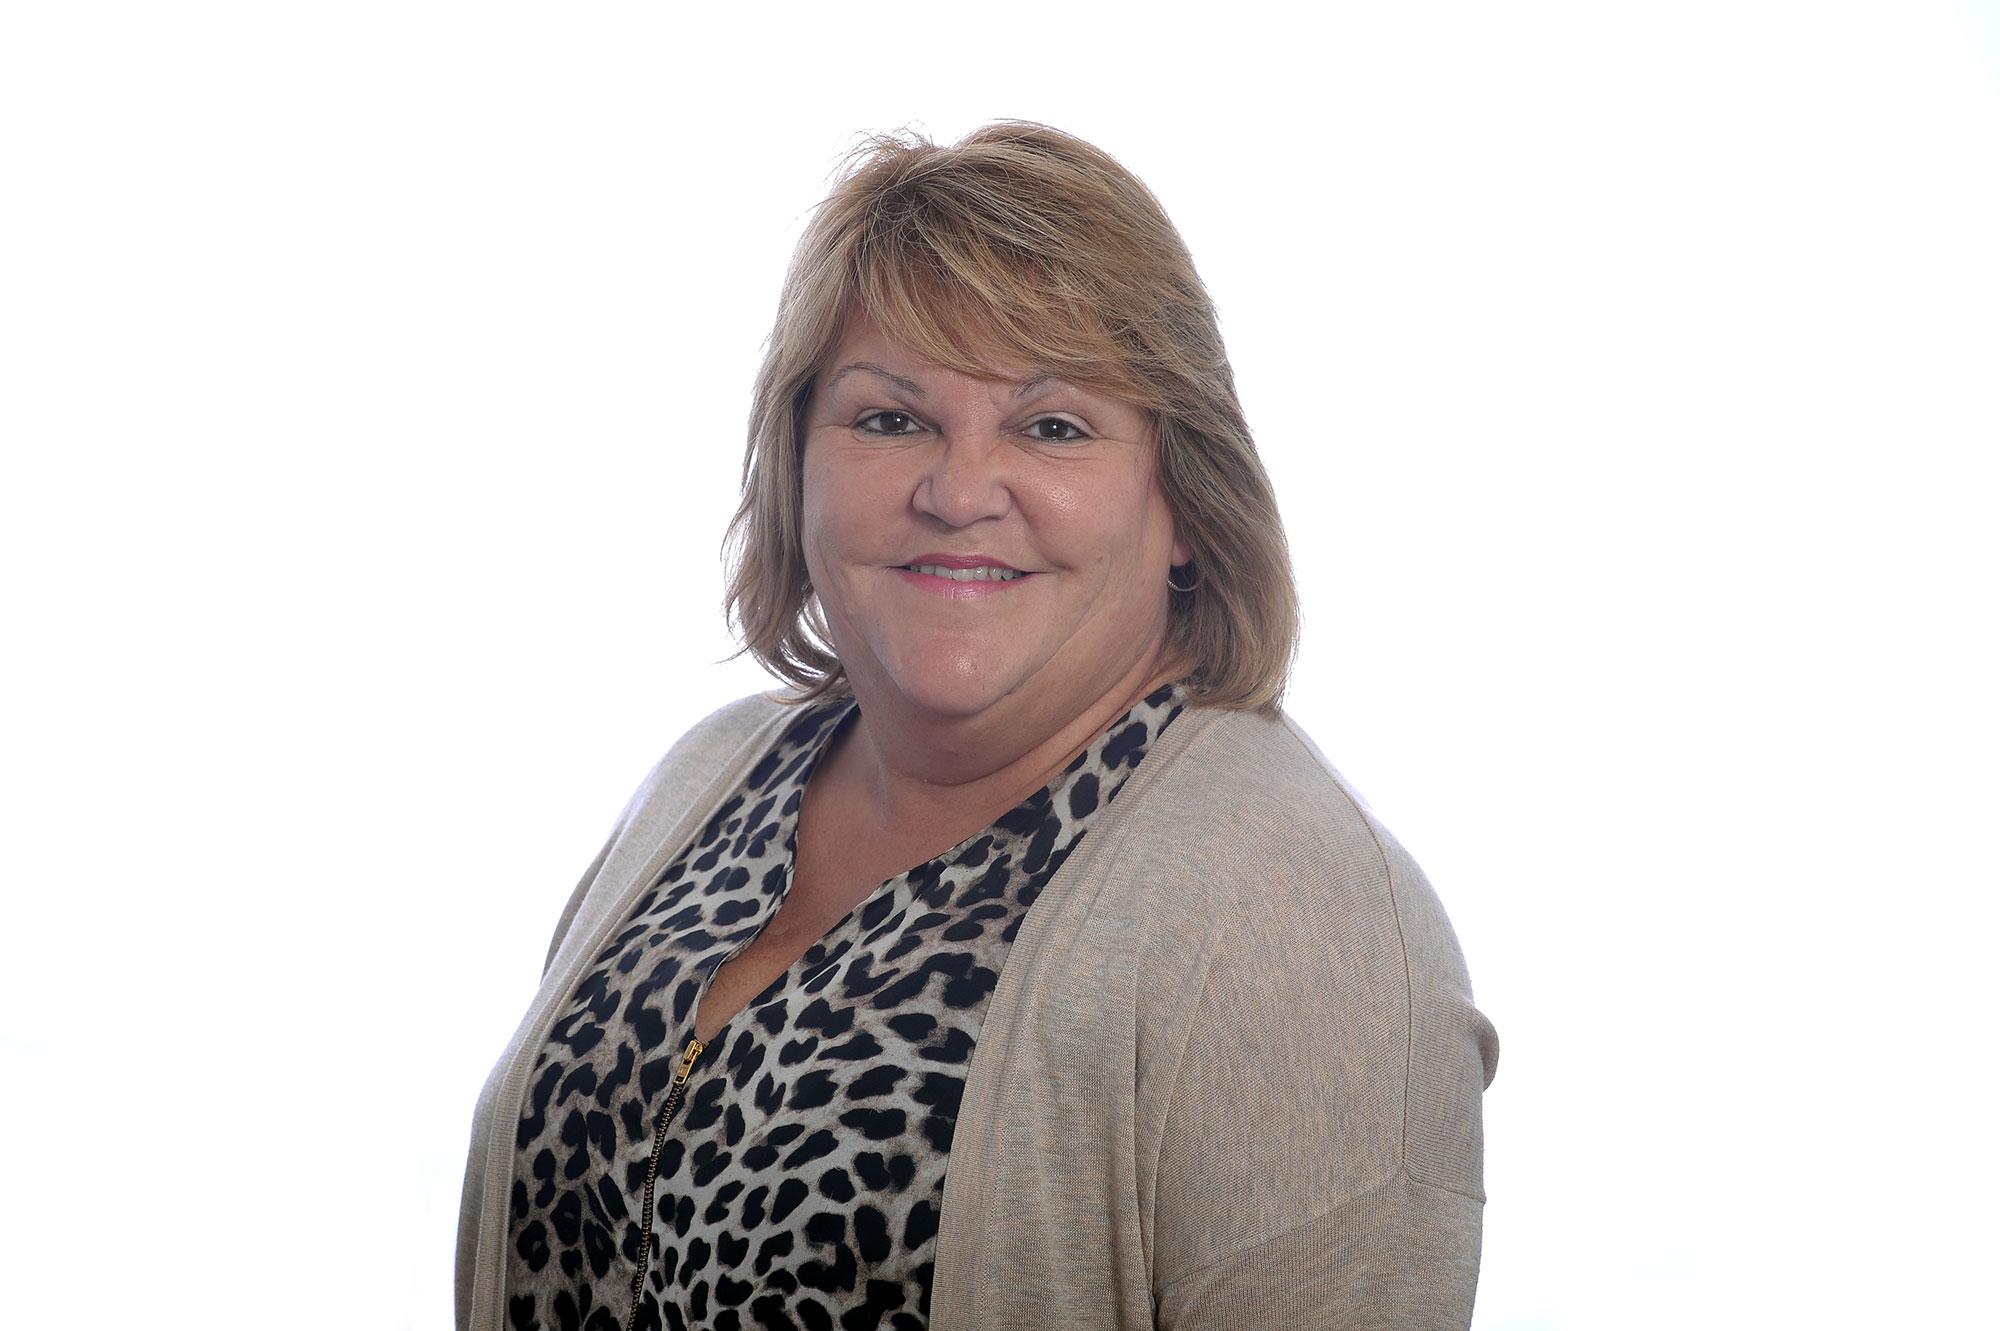 Kathy Batchford